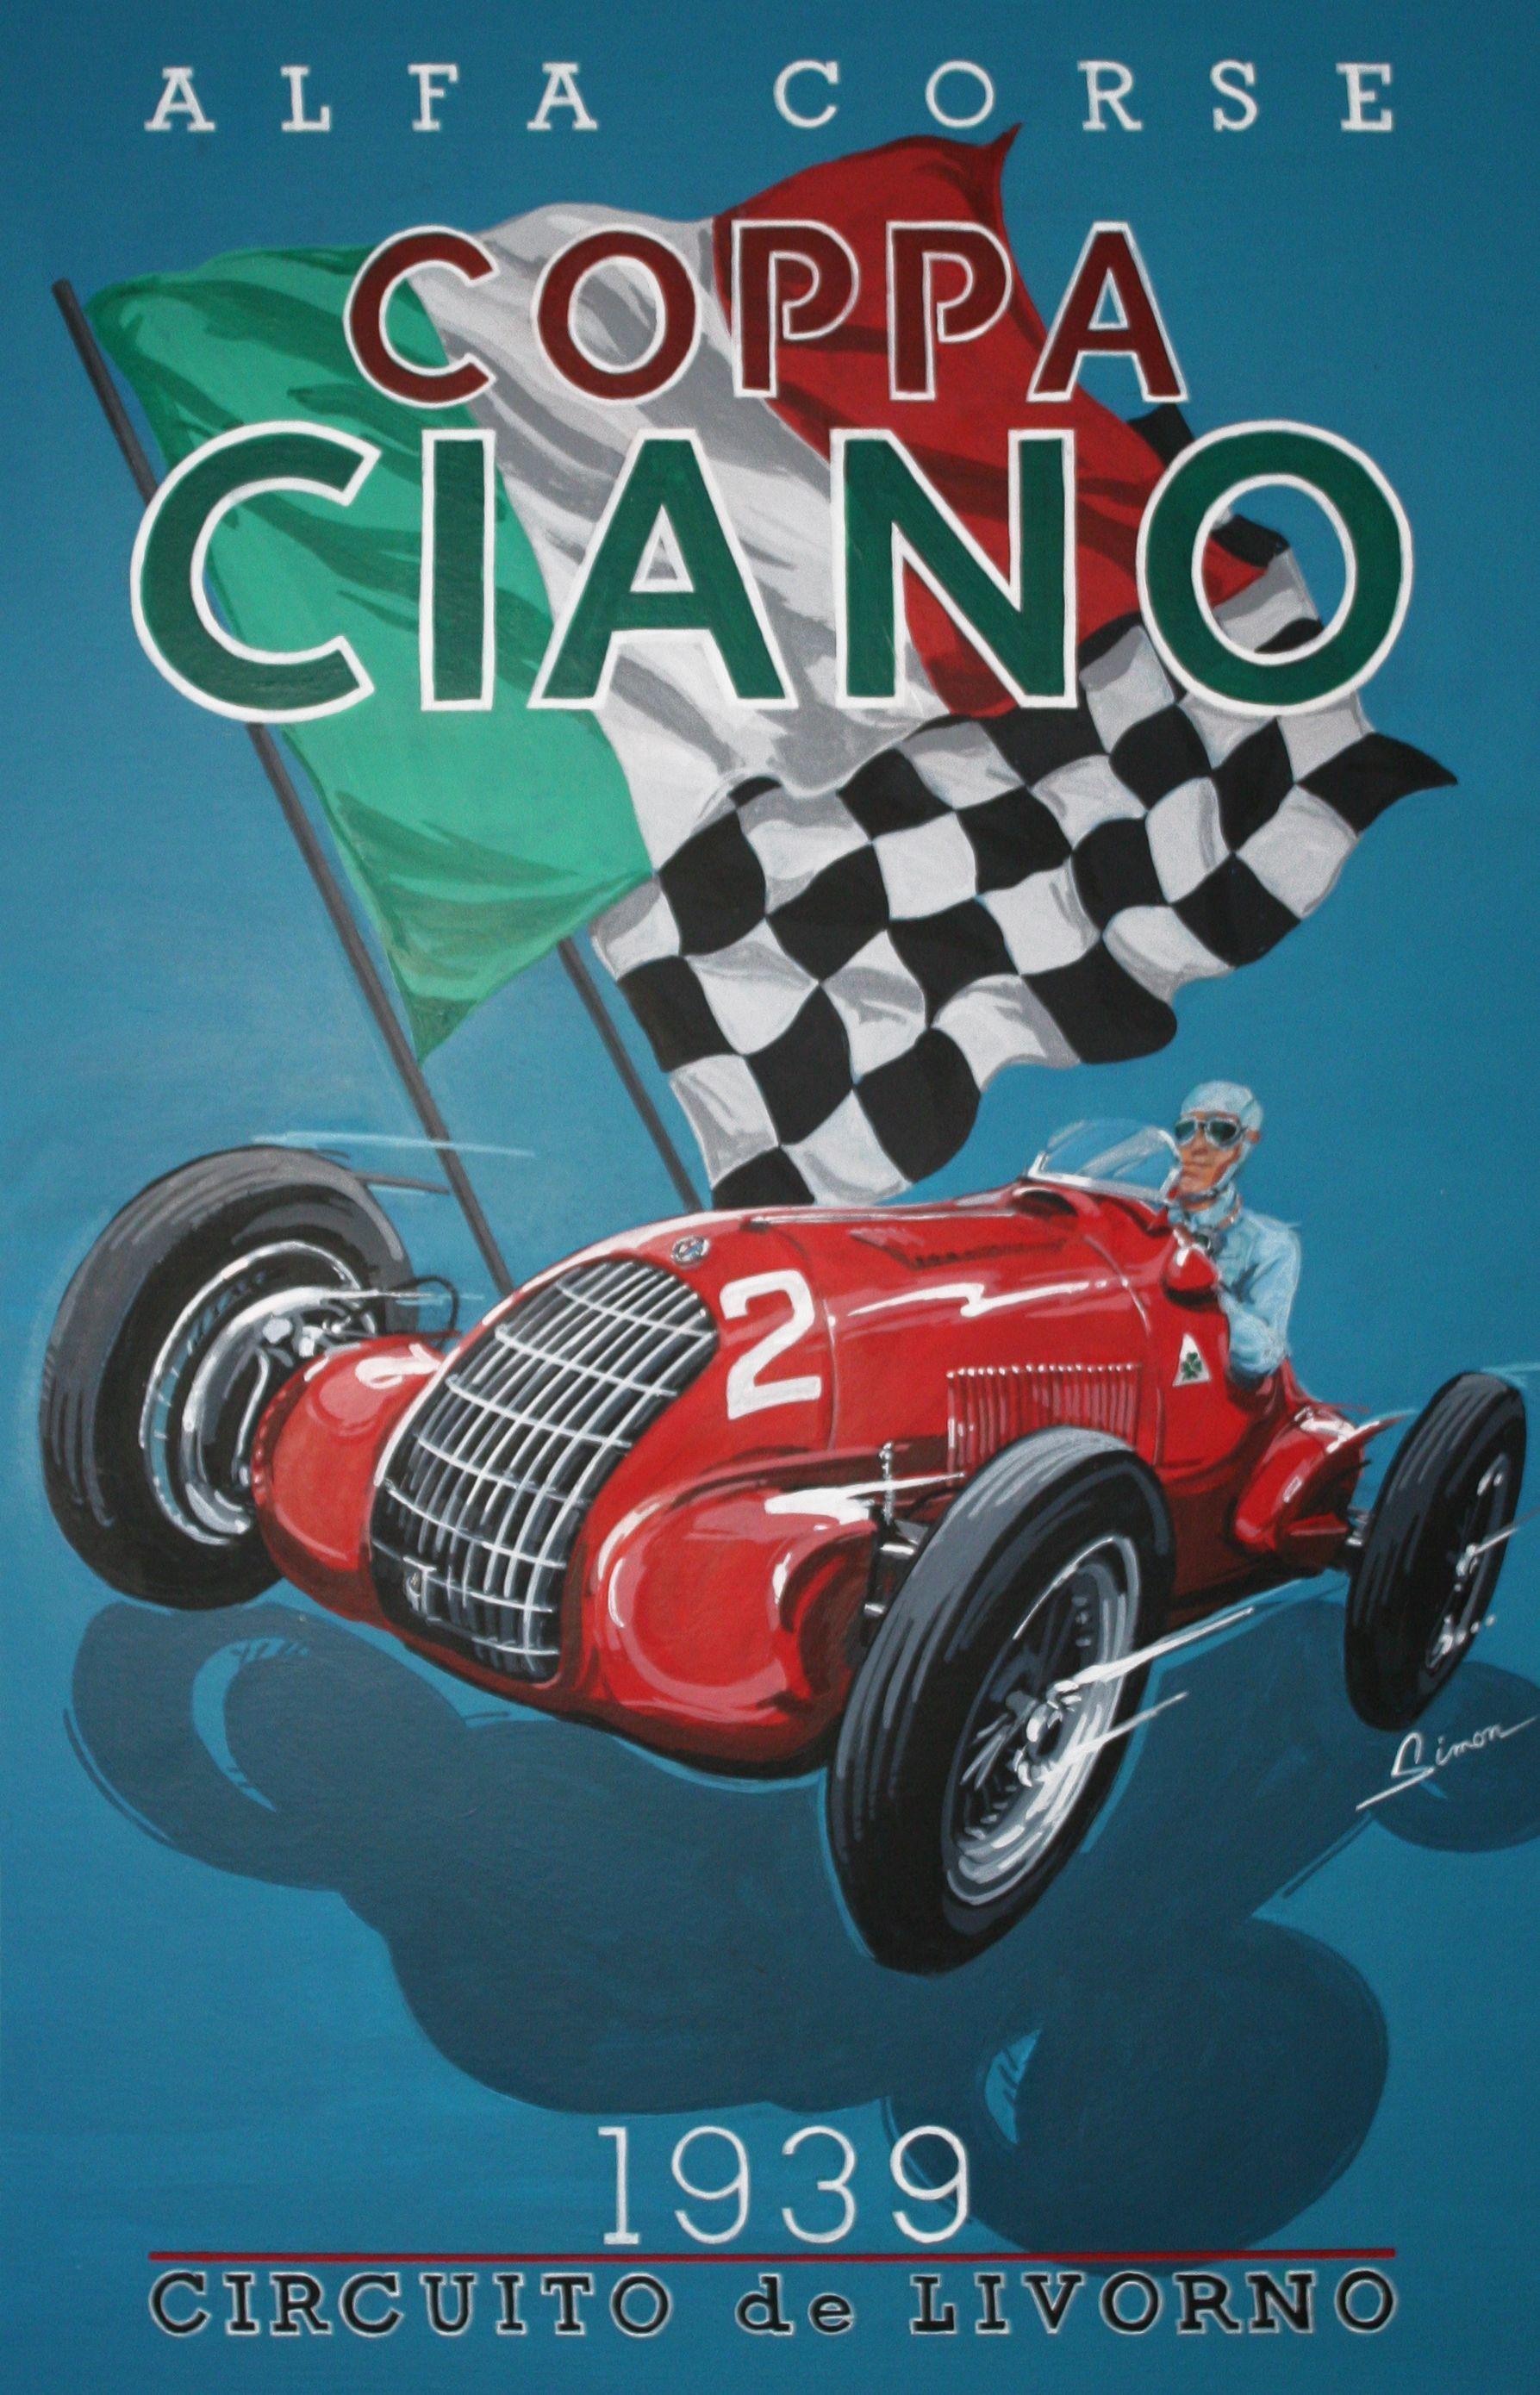 Alfa Romeo Coppa Ciano Grand Prix , Vintage Style Racing Poster, by ...